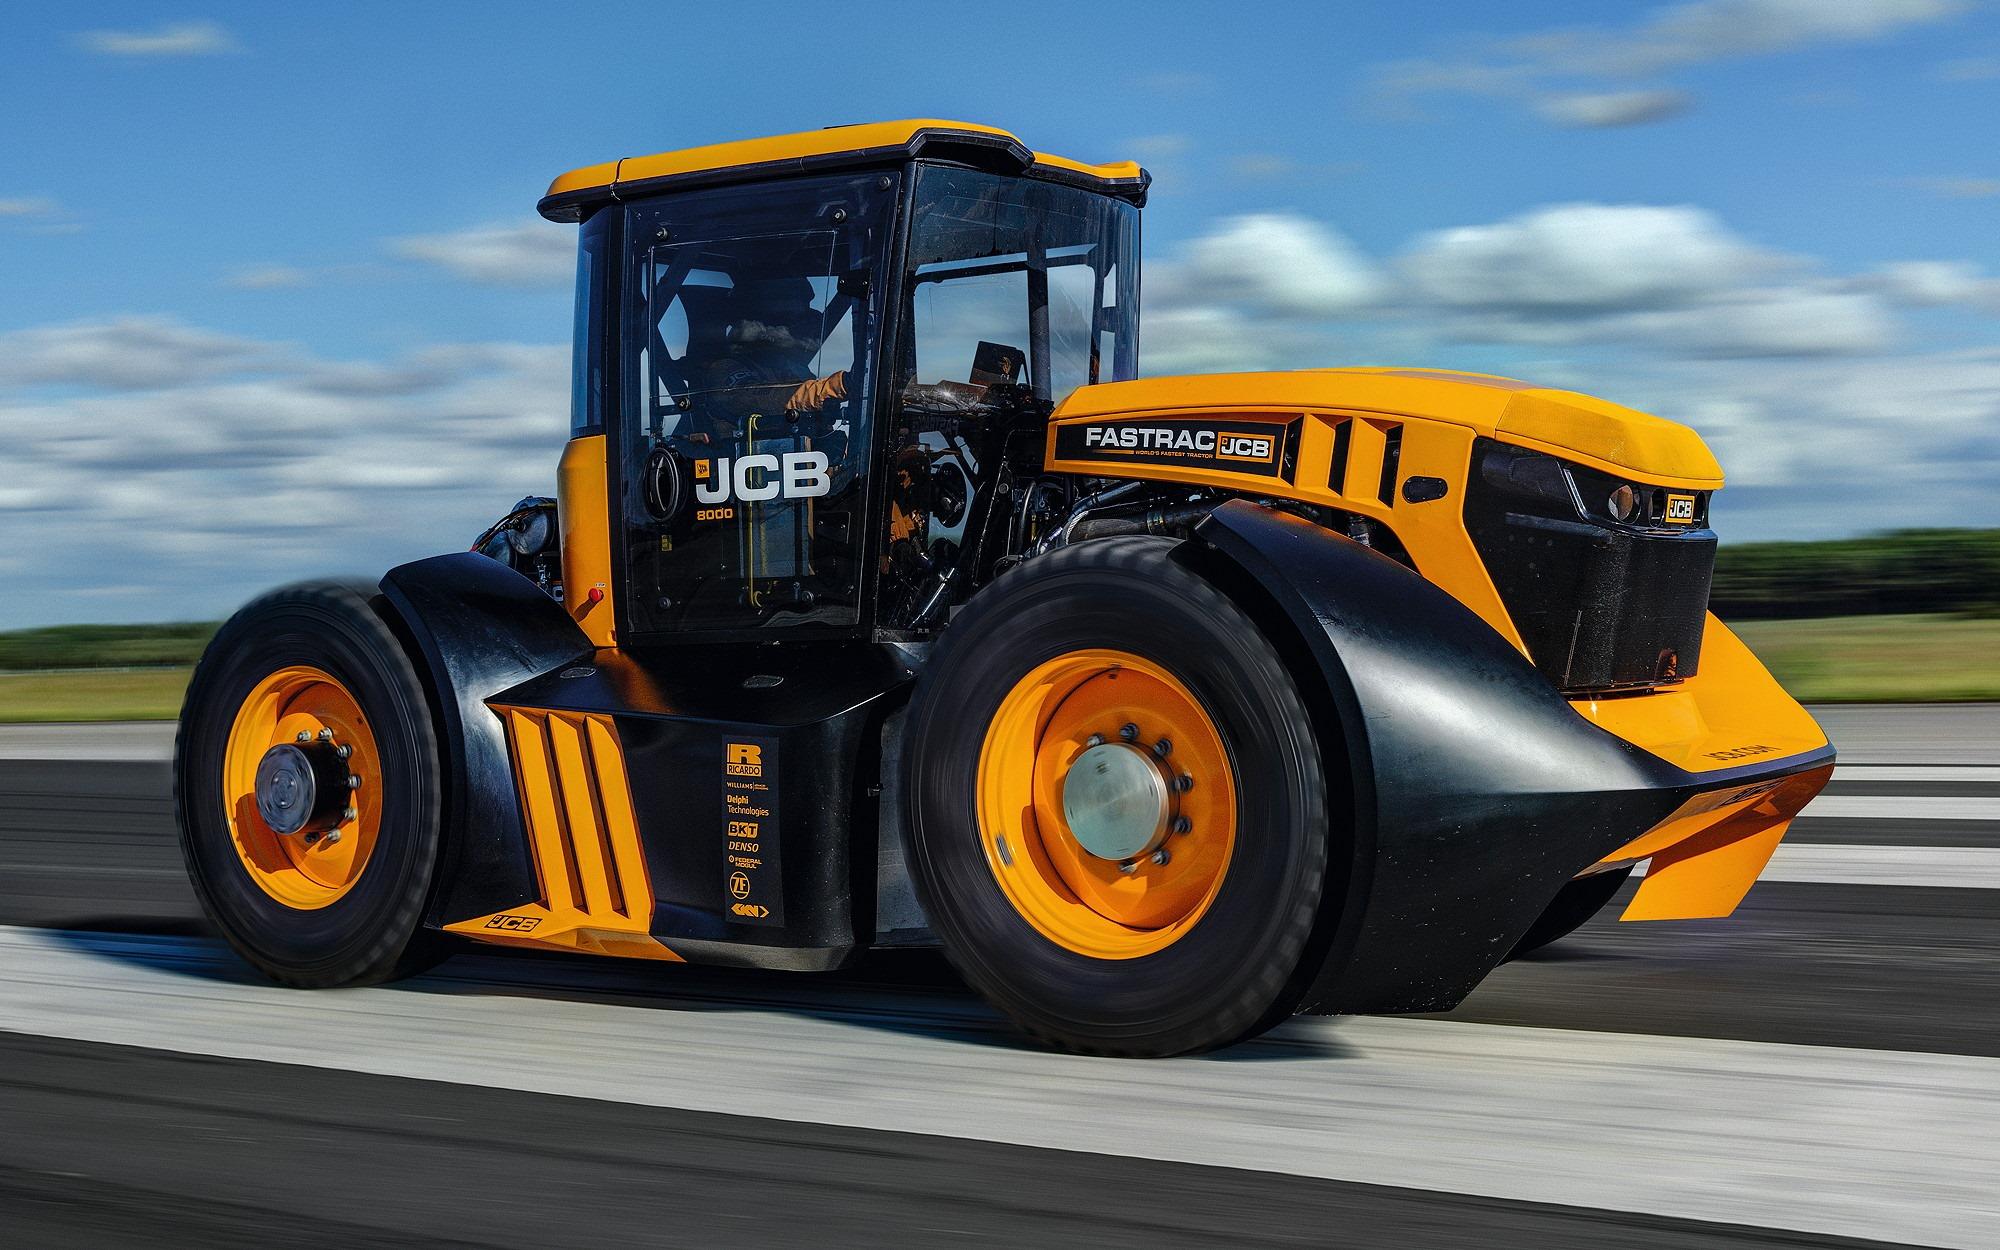 JCB Fastrac tractor with a 7.2 L Dieselmax inline-six